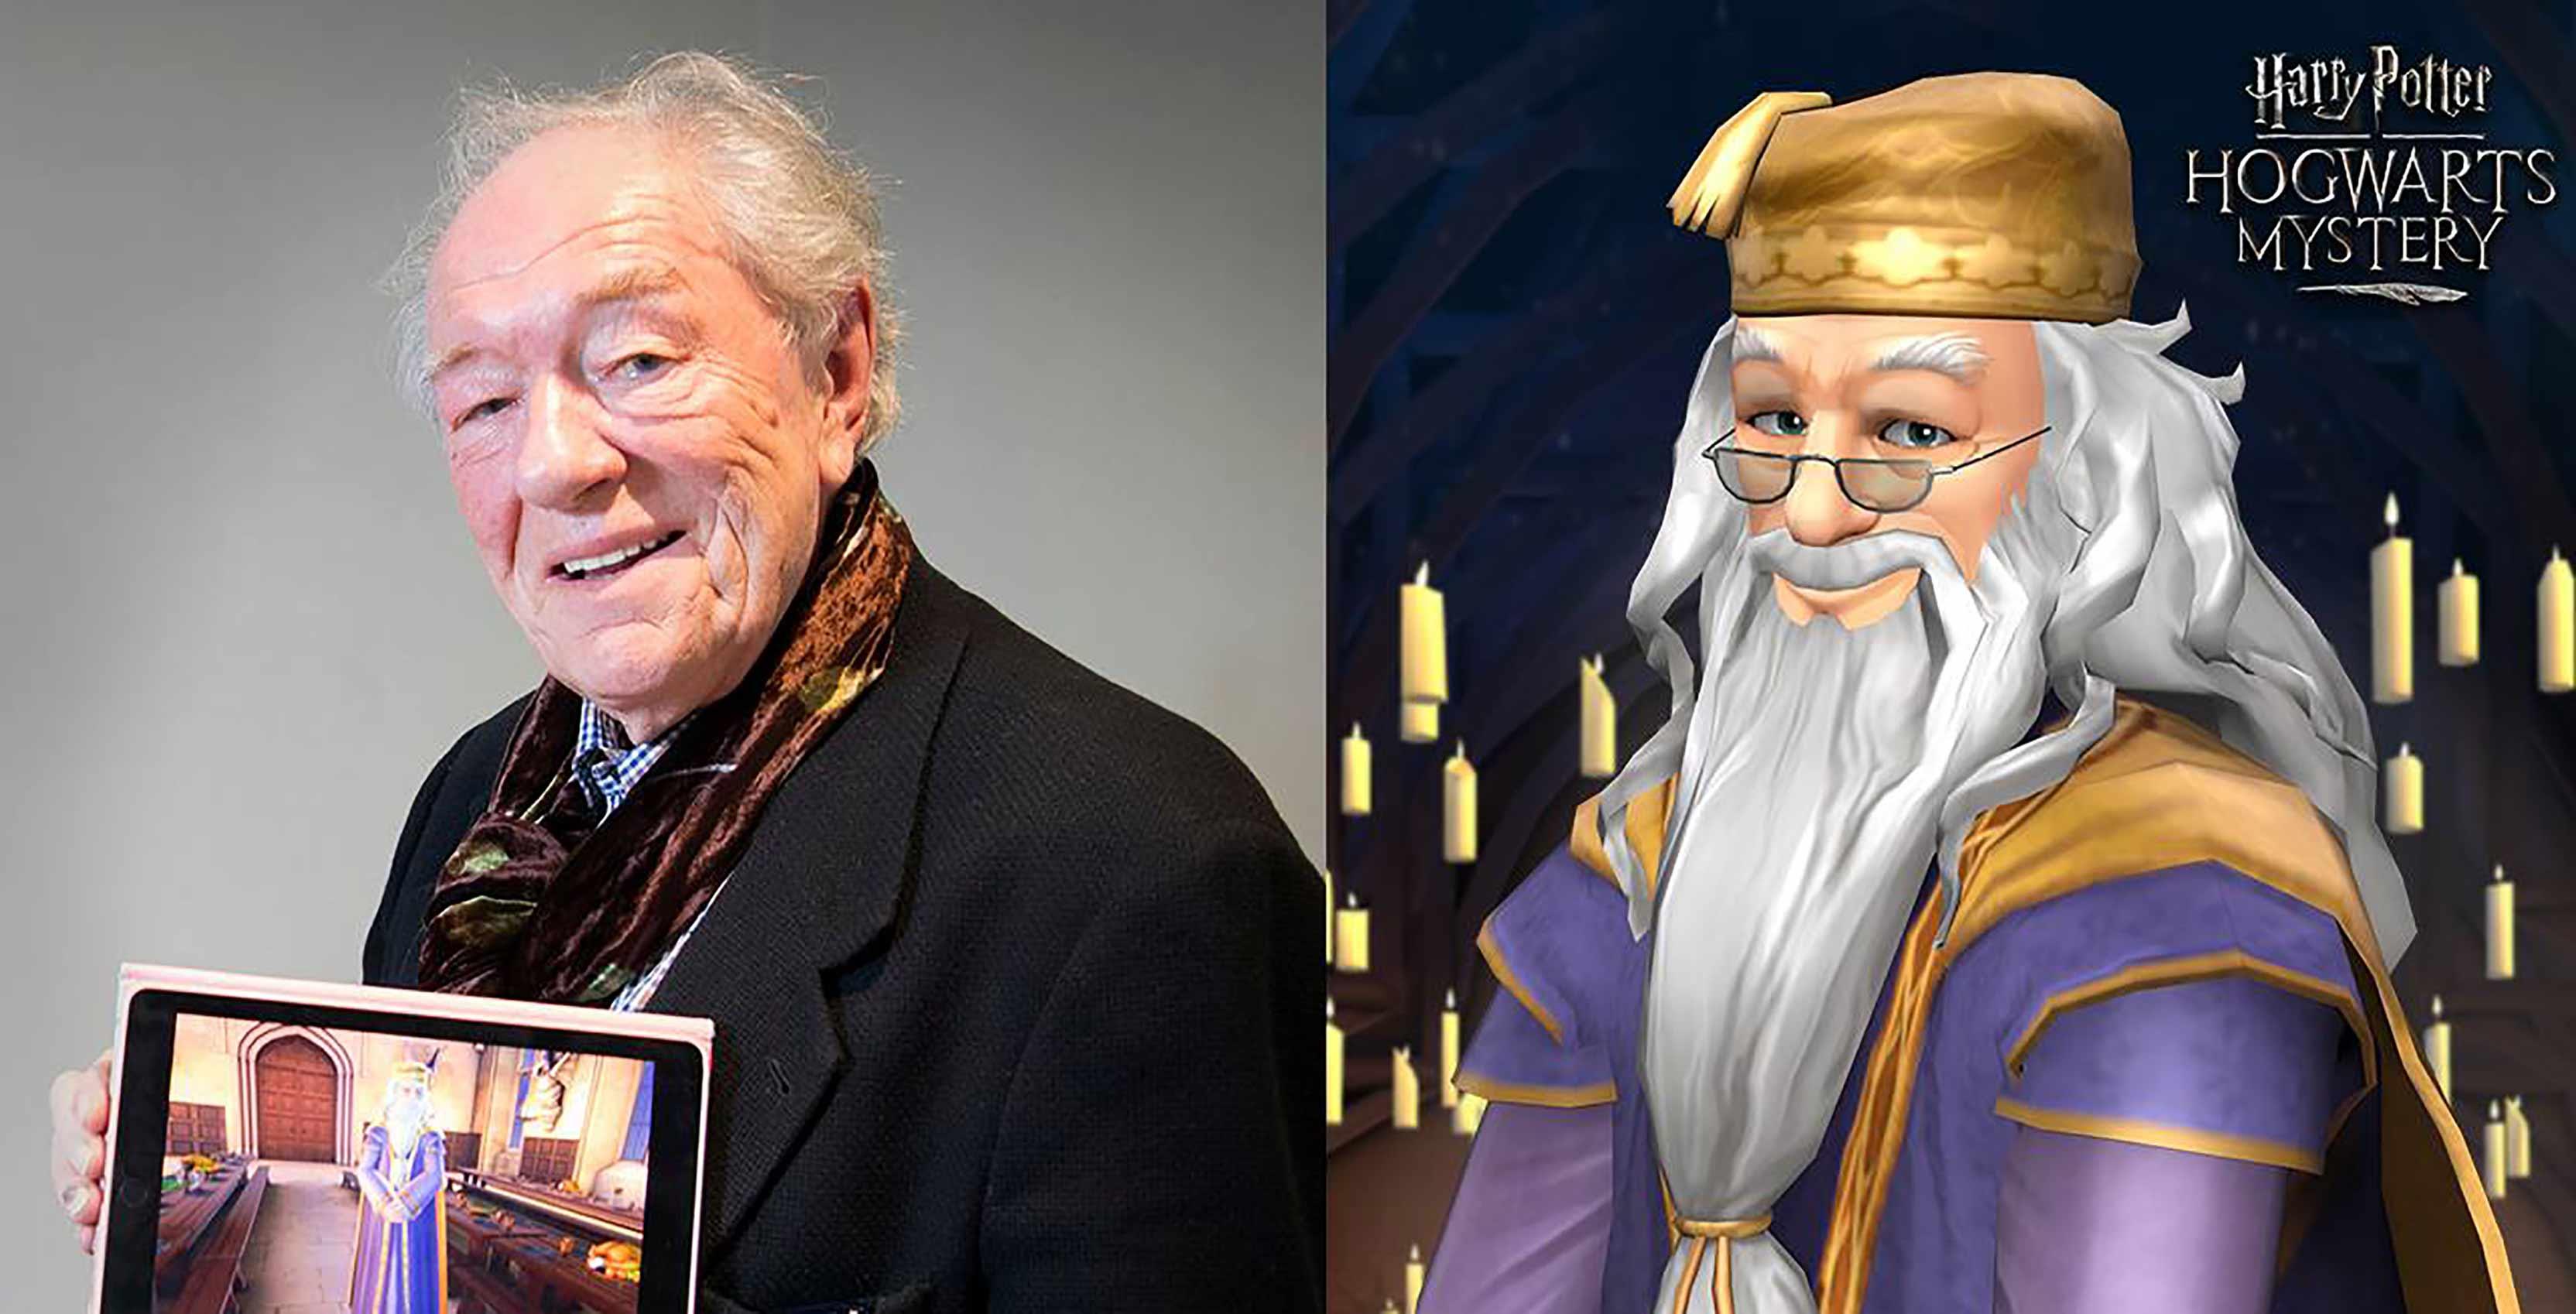 Harry Potter Hogwarts Mystery Michael Gambon